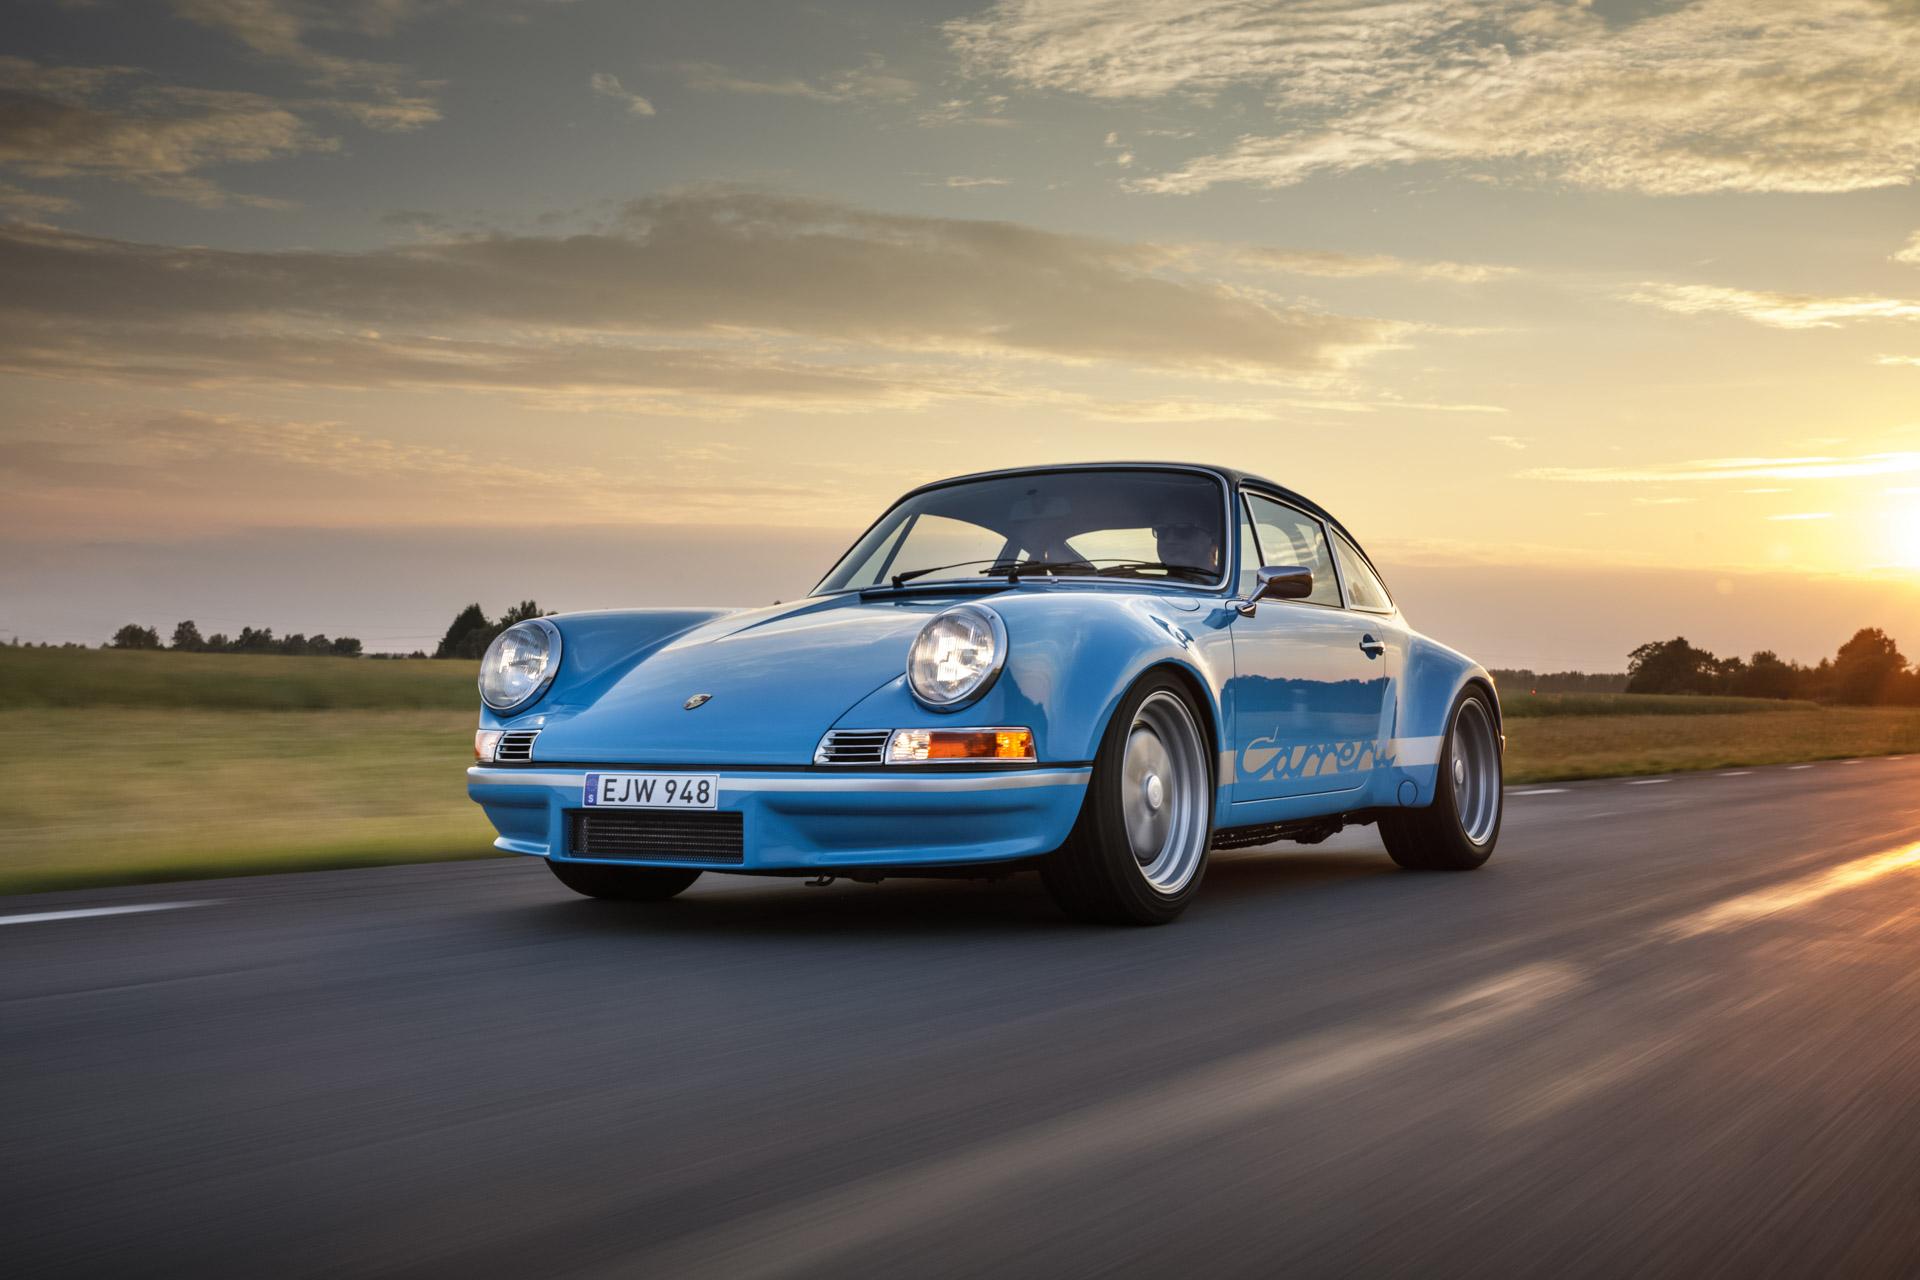 Porsche 911 and 356 motion shots